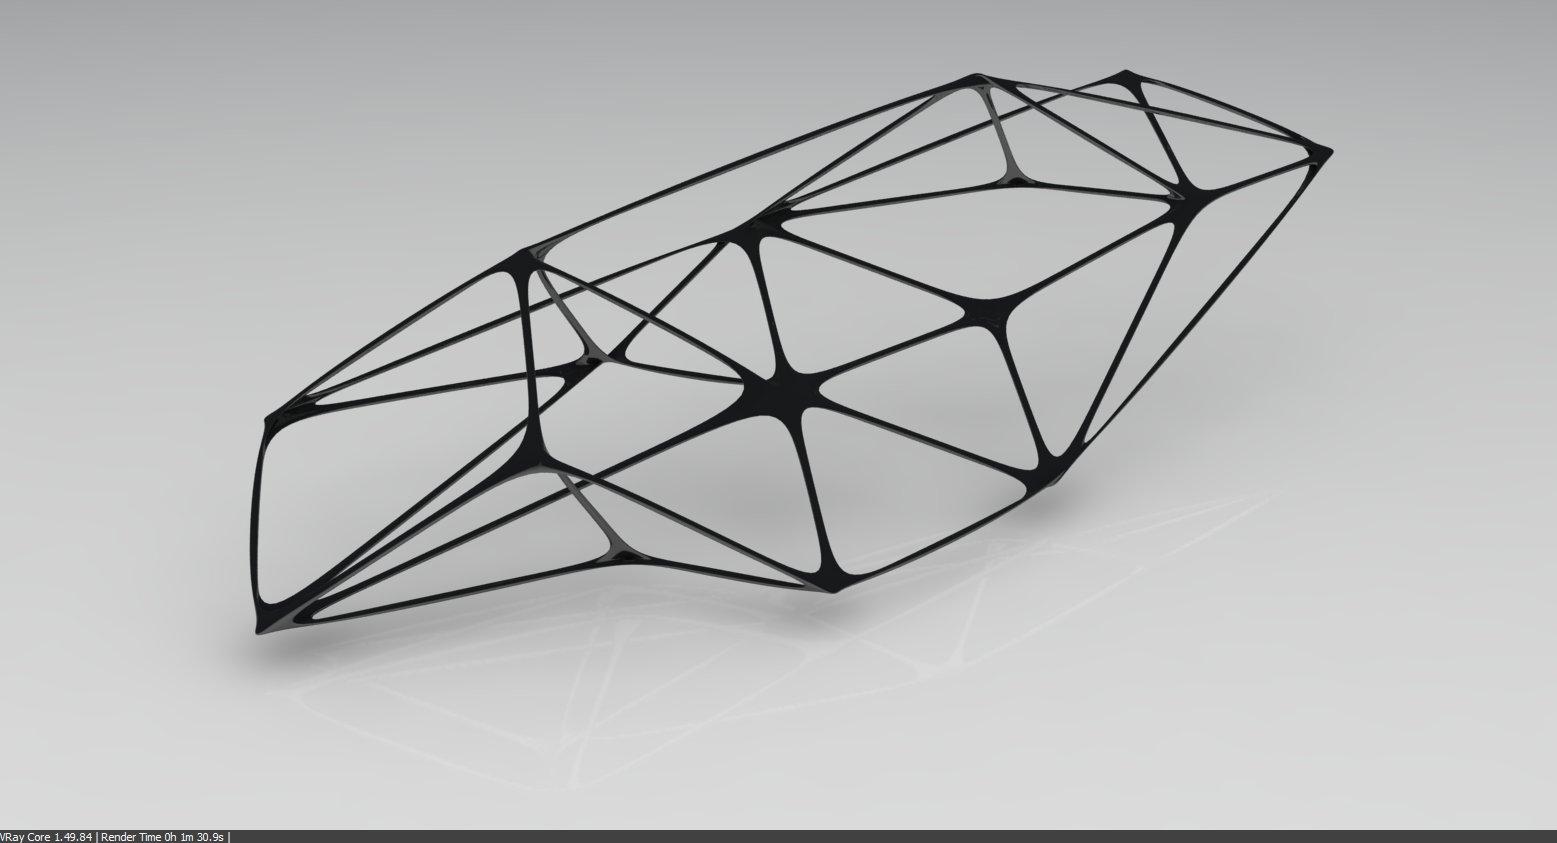 Organic Space Frame | the leda atomicus